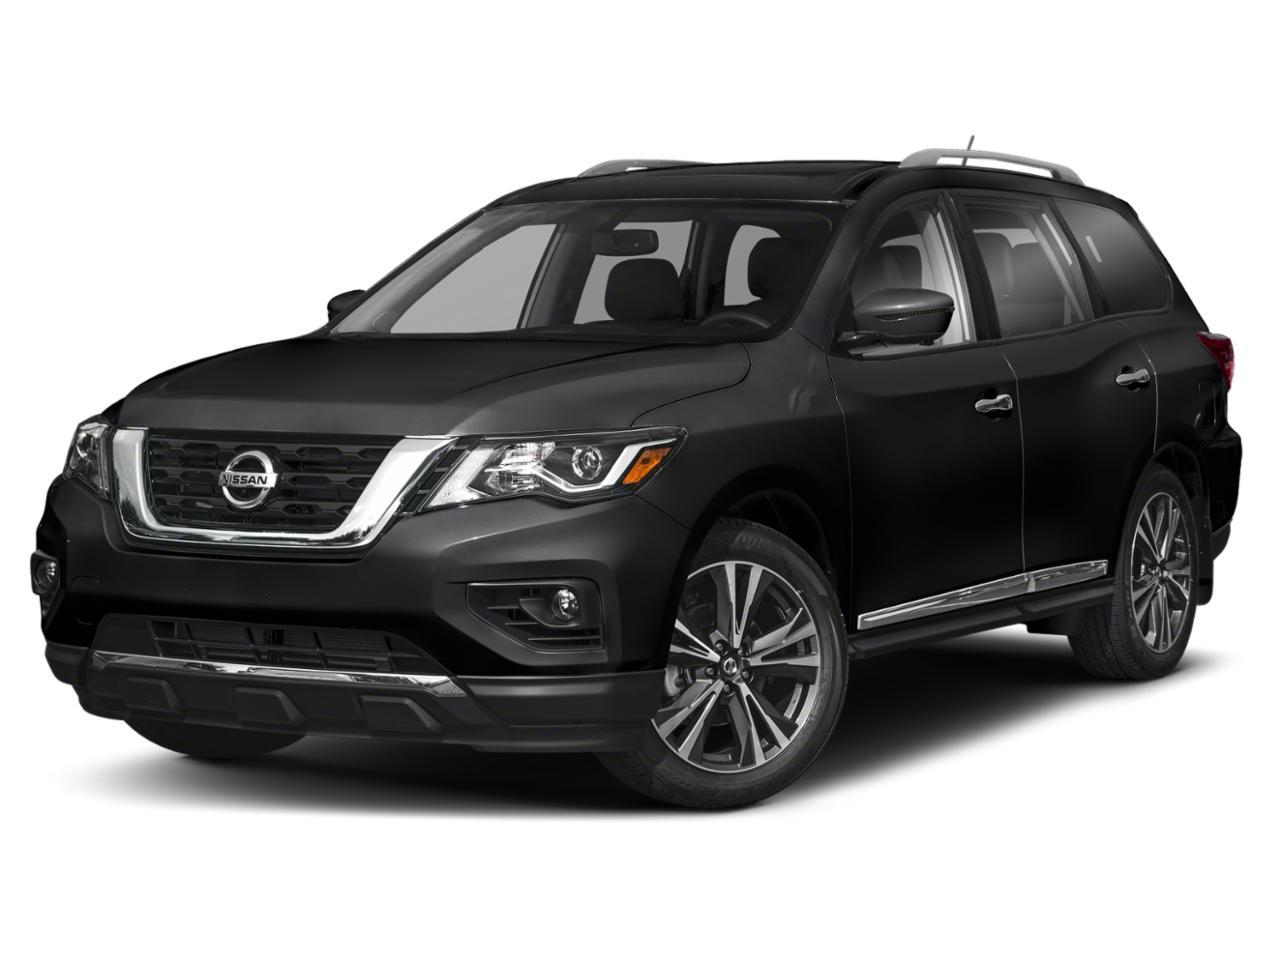 2020 Nissan Pathfinder PLATINUM SUV Slide